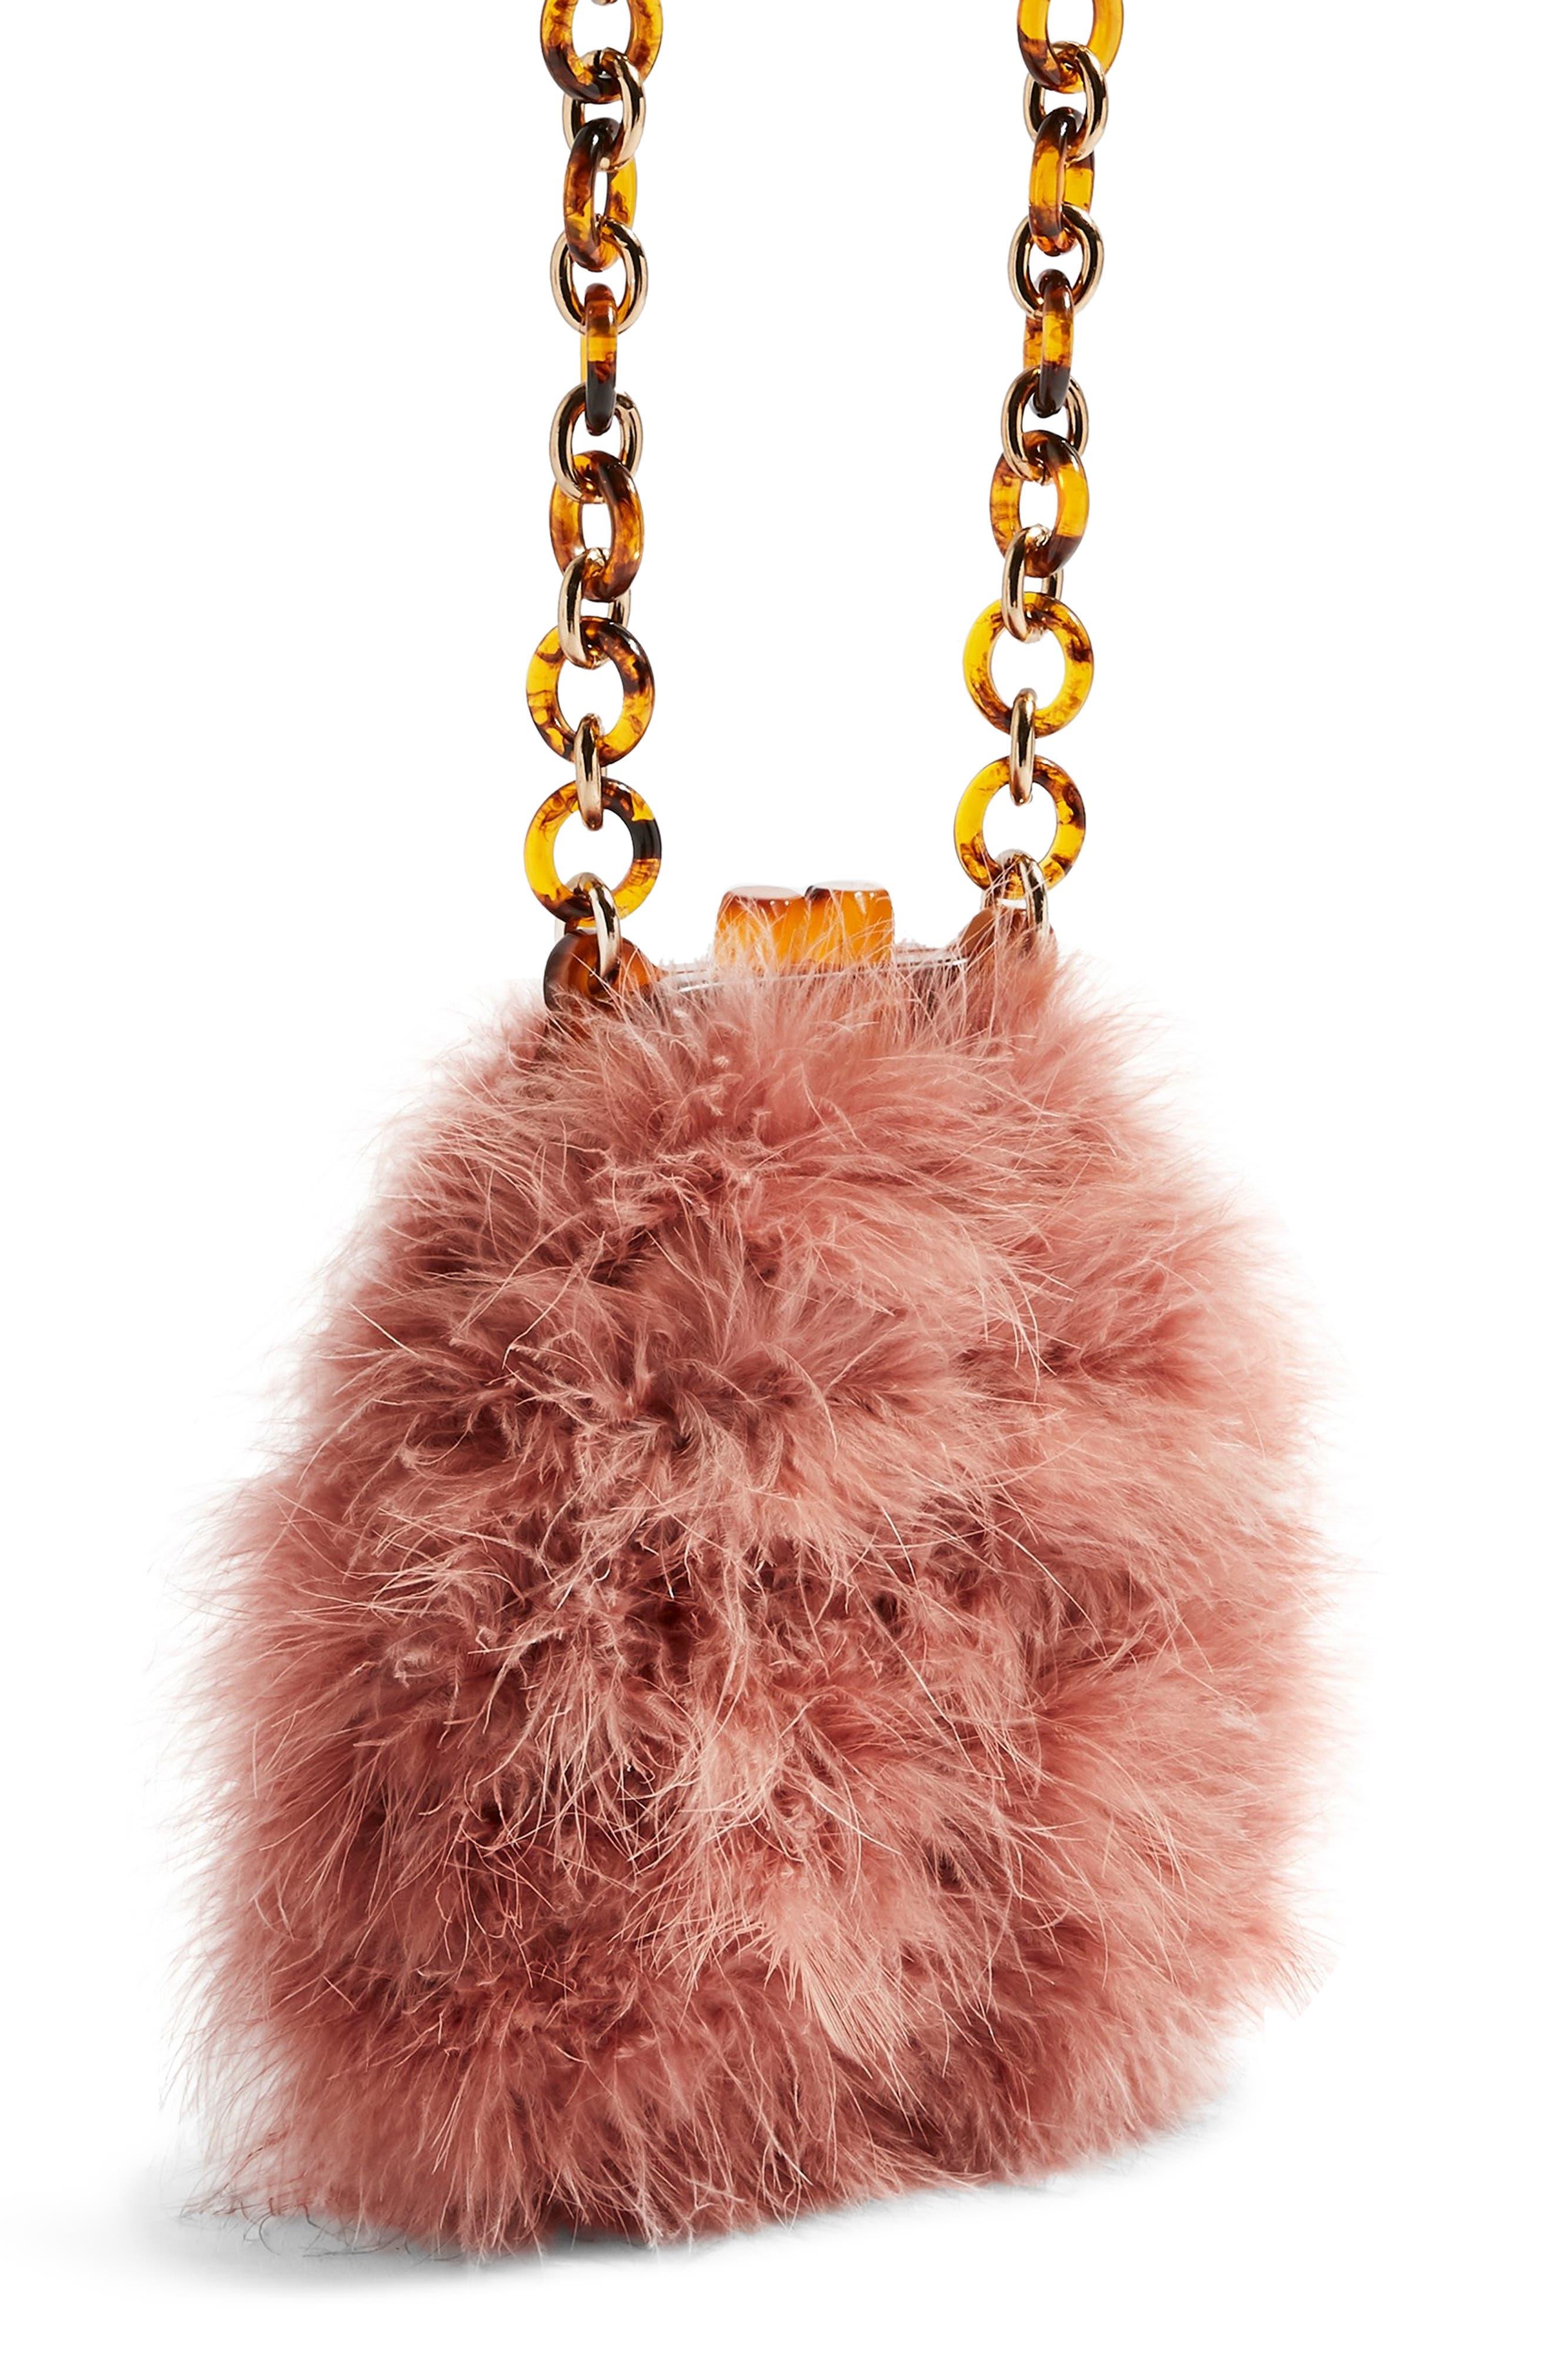 Marabou Feather Frame Handbag,                             Alternate thumbnail 4, color,                             PINK MULTI